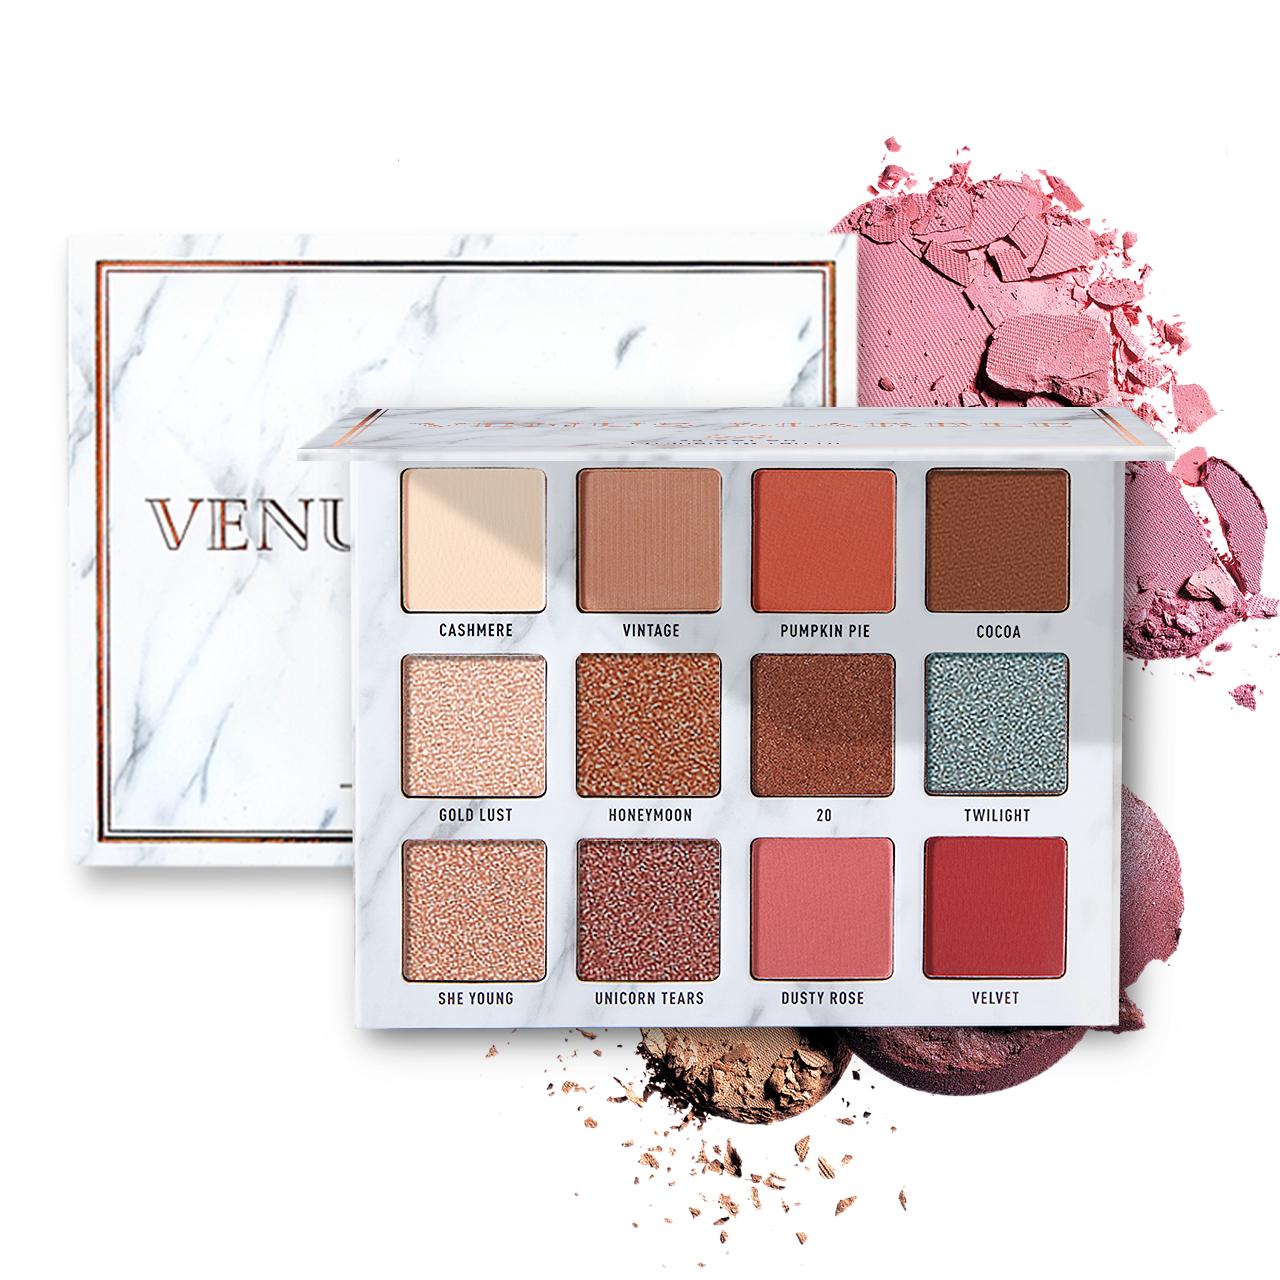 VENUS MARBLE大理石眼影12色官方正品珠光大地色哑光超火彩妆盘